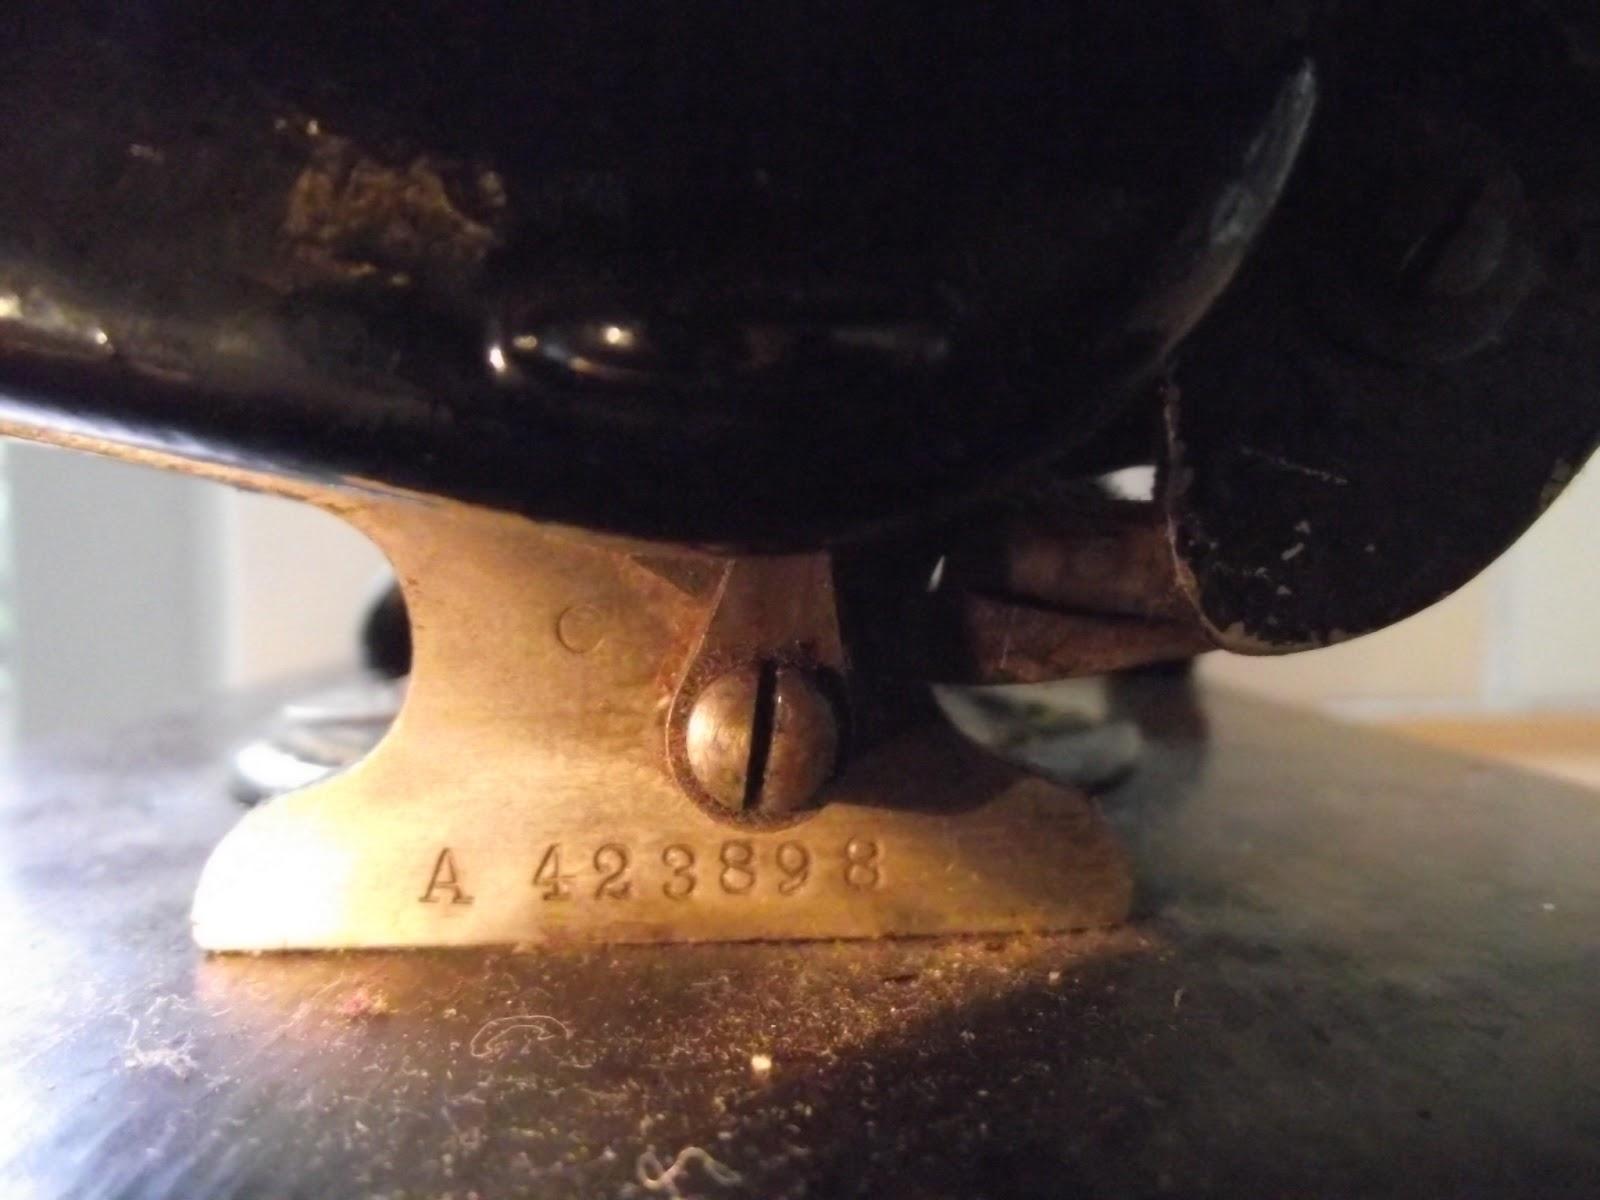 willcox & gibbs serial numbers